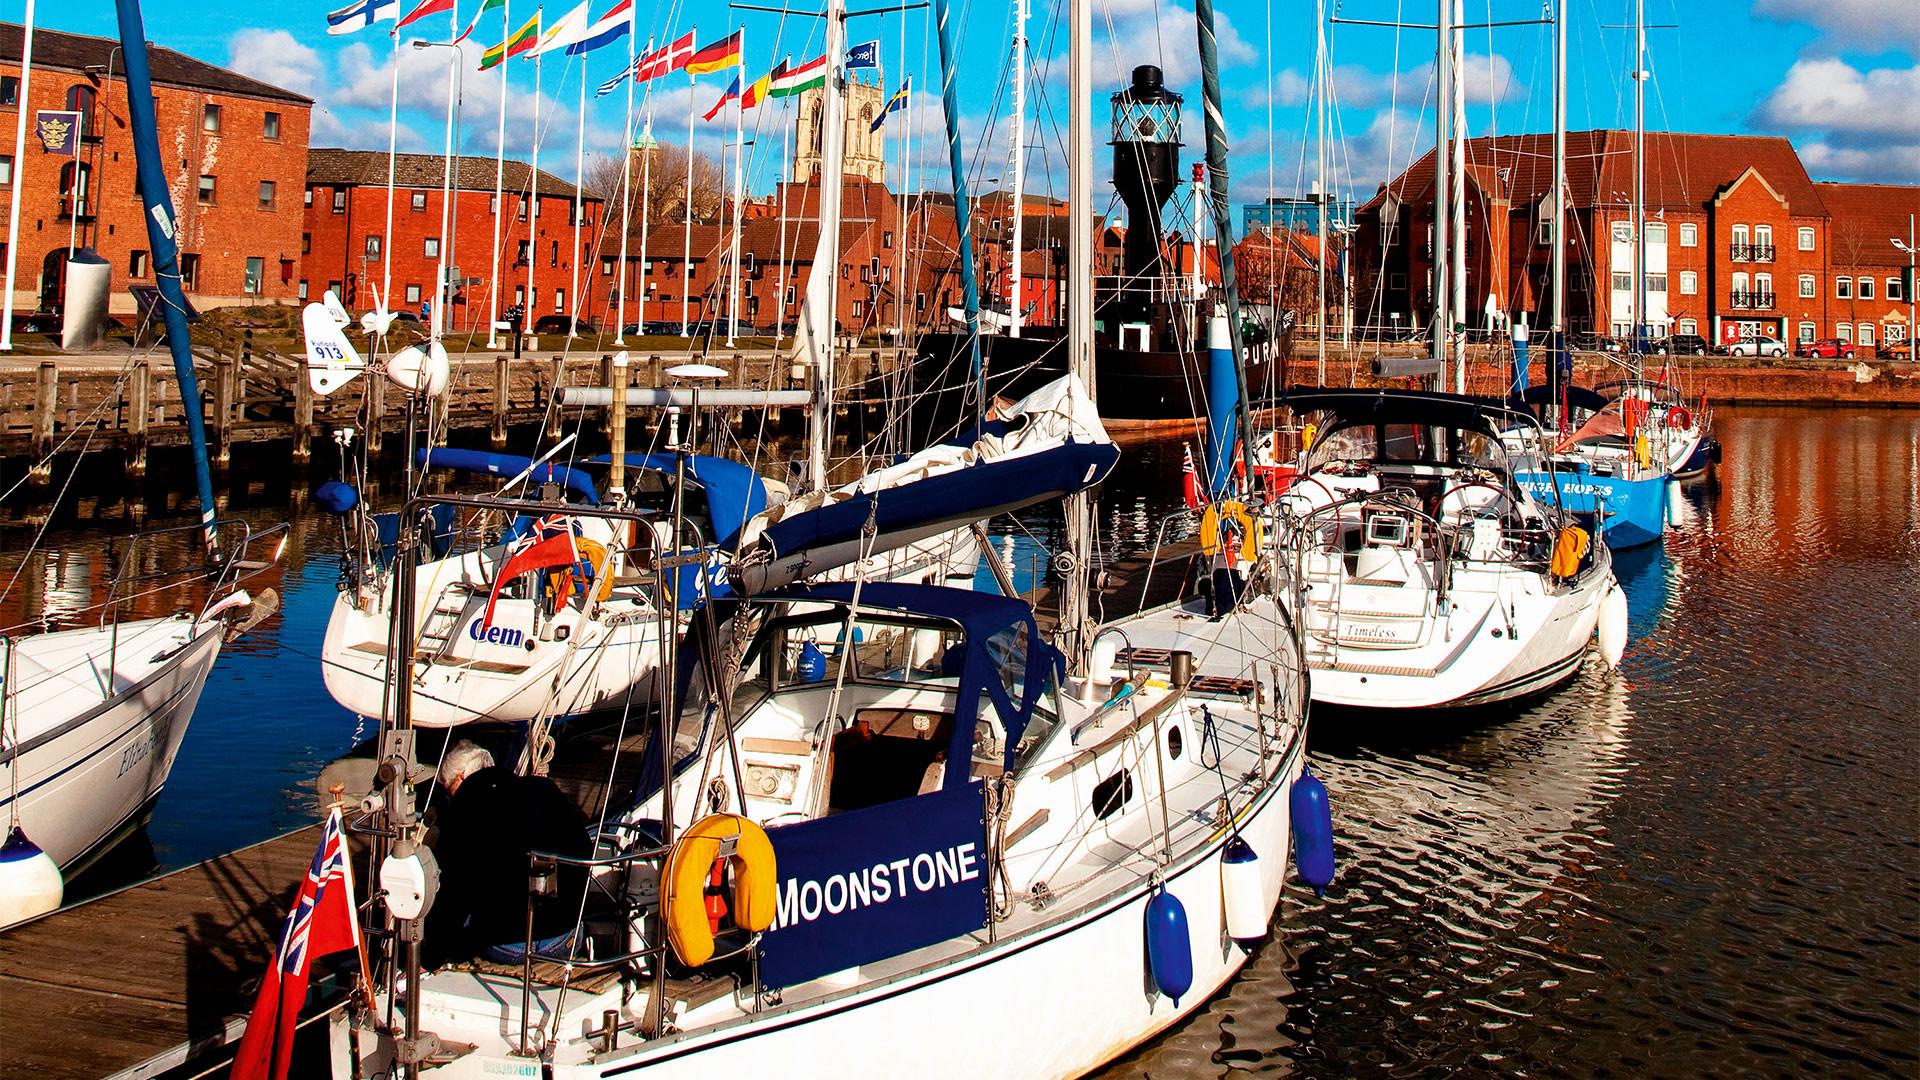 Photograph of Hull Marina